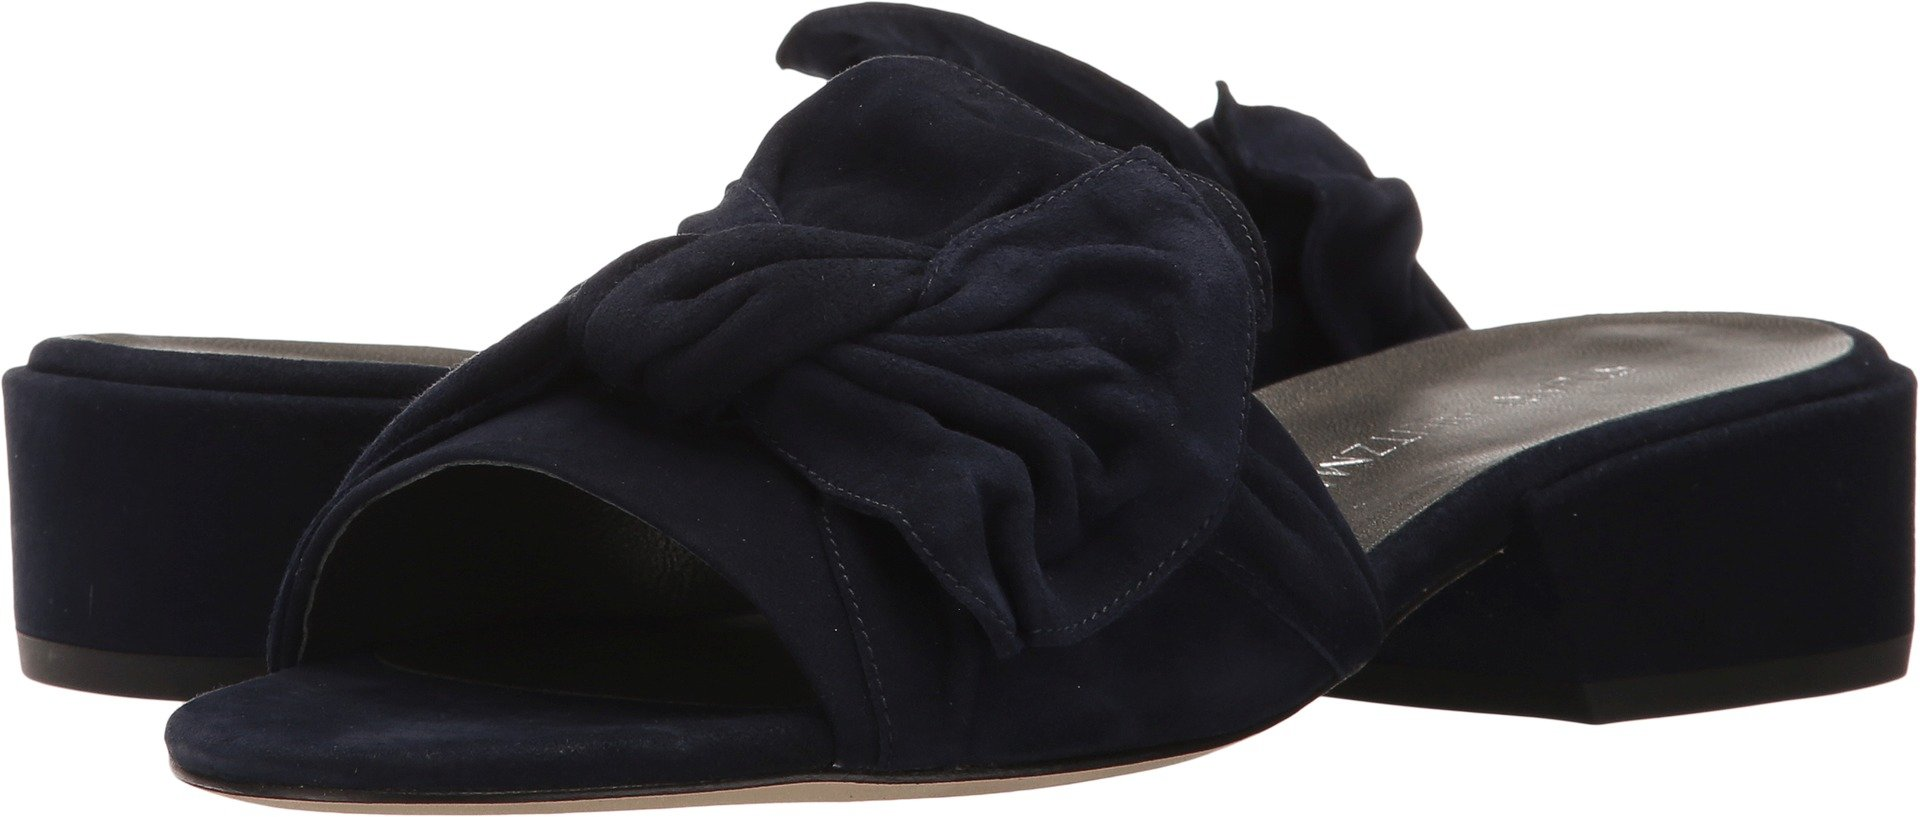 Stuart Weitzman Women's Giftwrap Nice Blue Suede Sandal